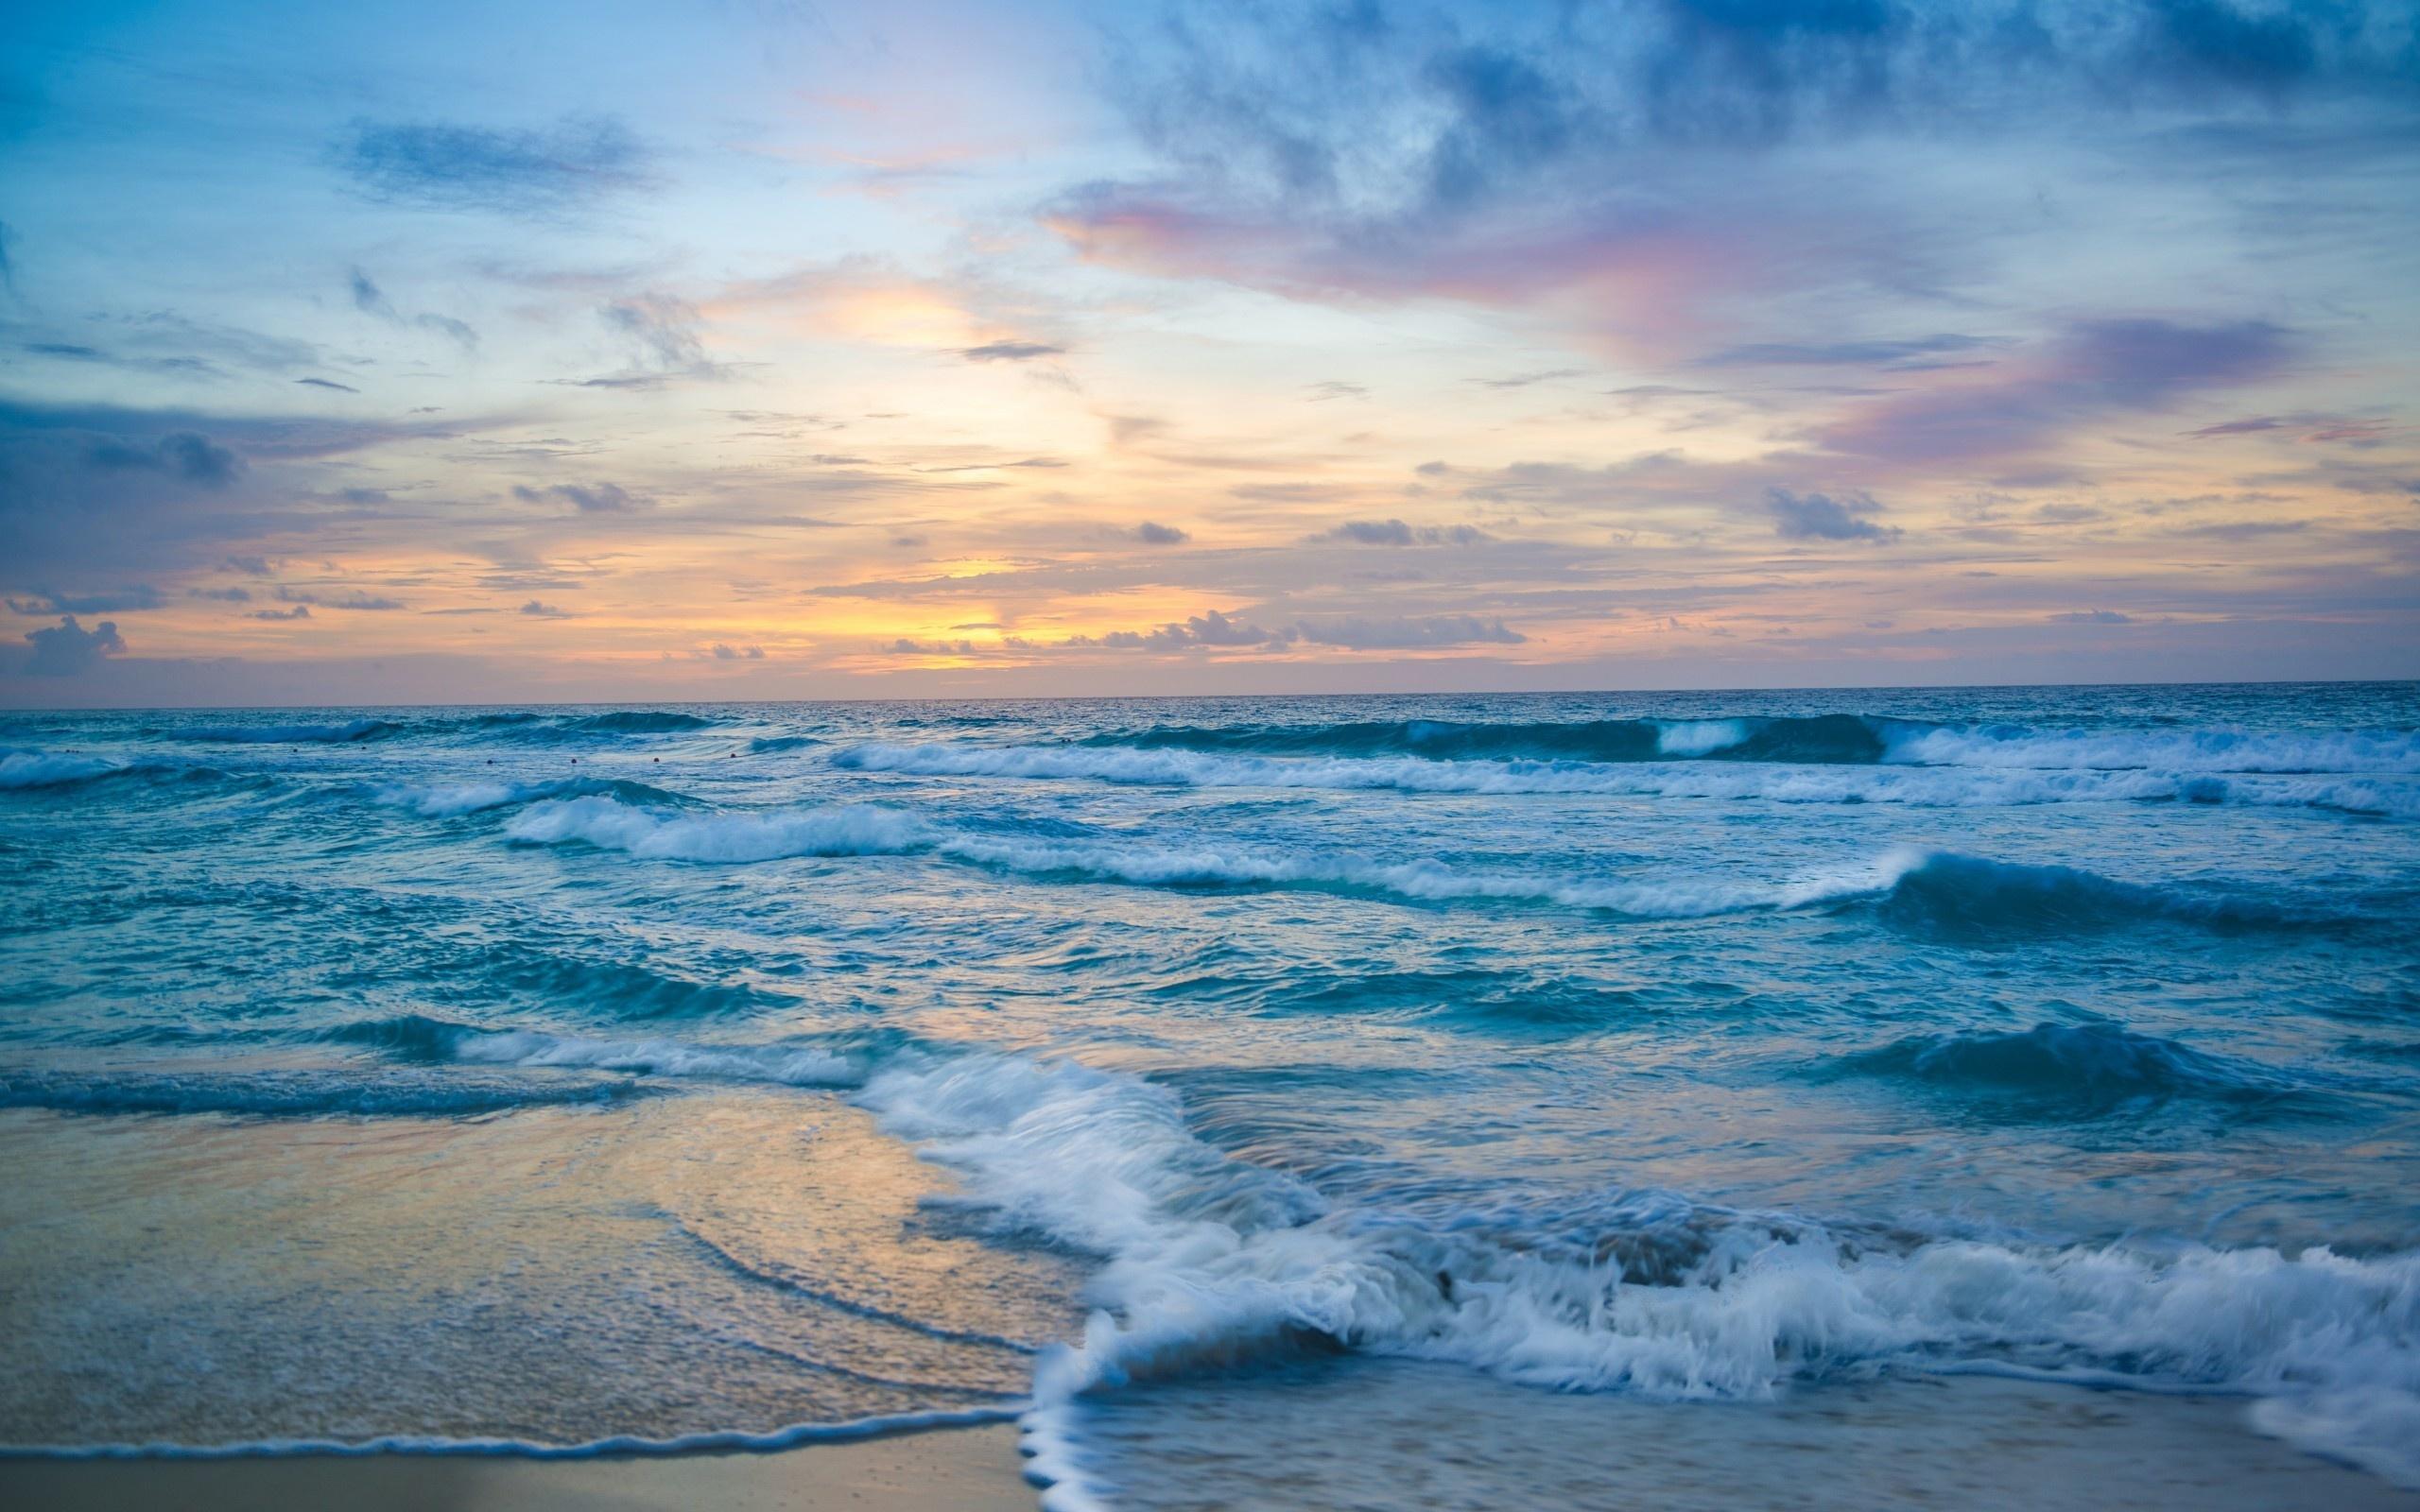 пена, природа, вечер, море, прибой, закат